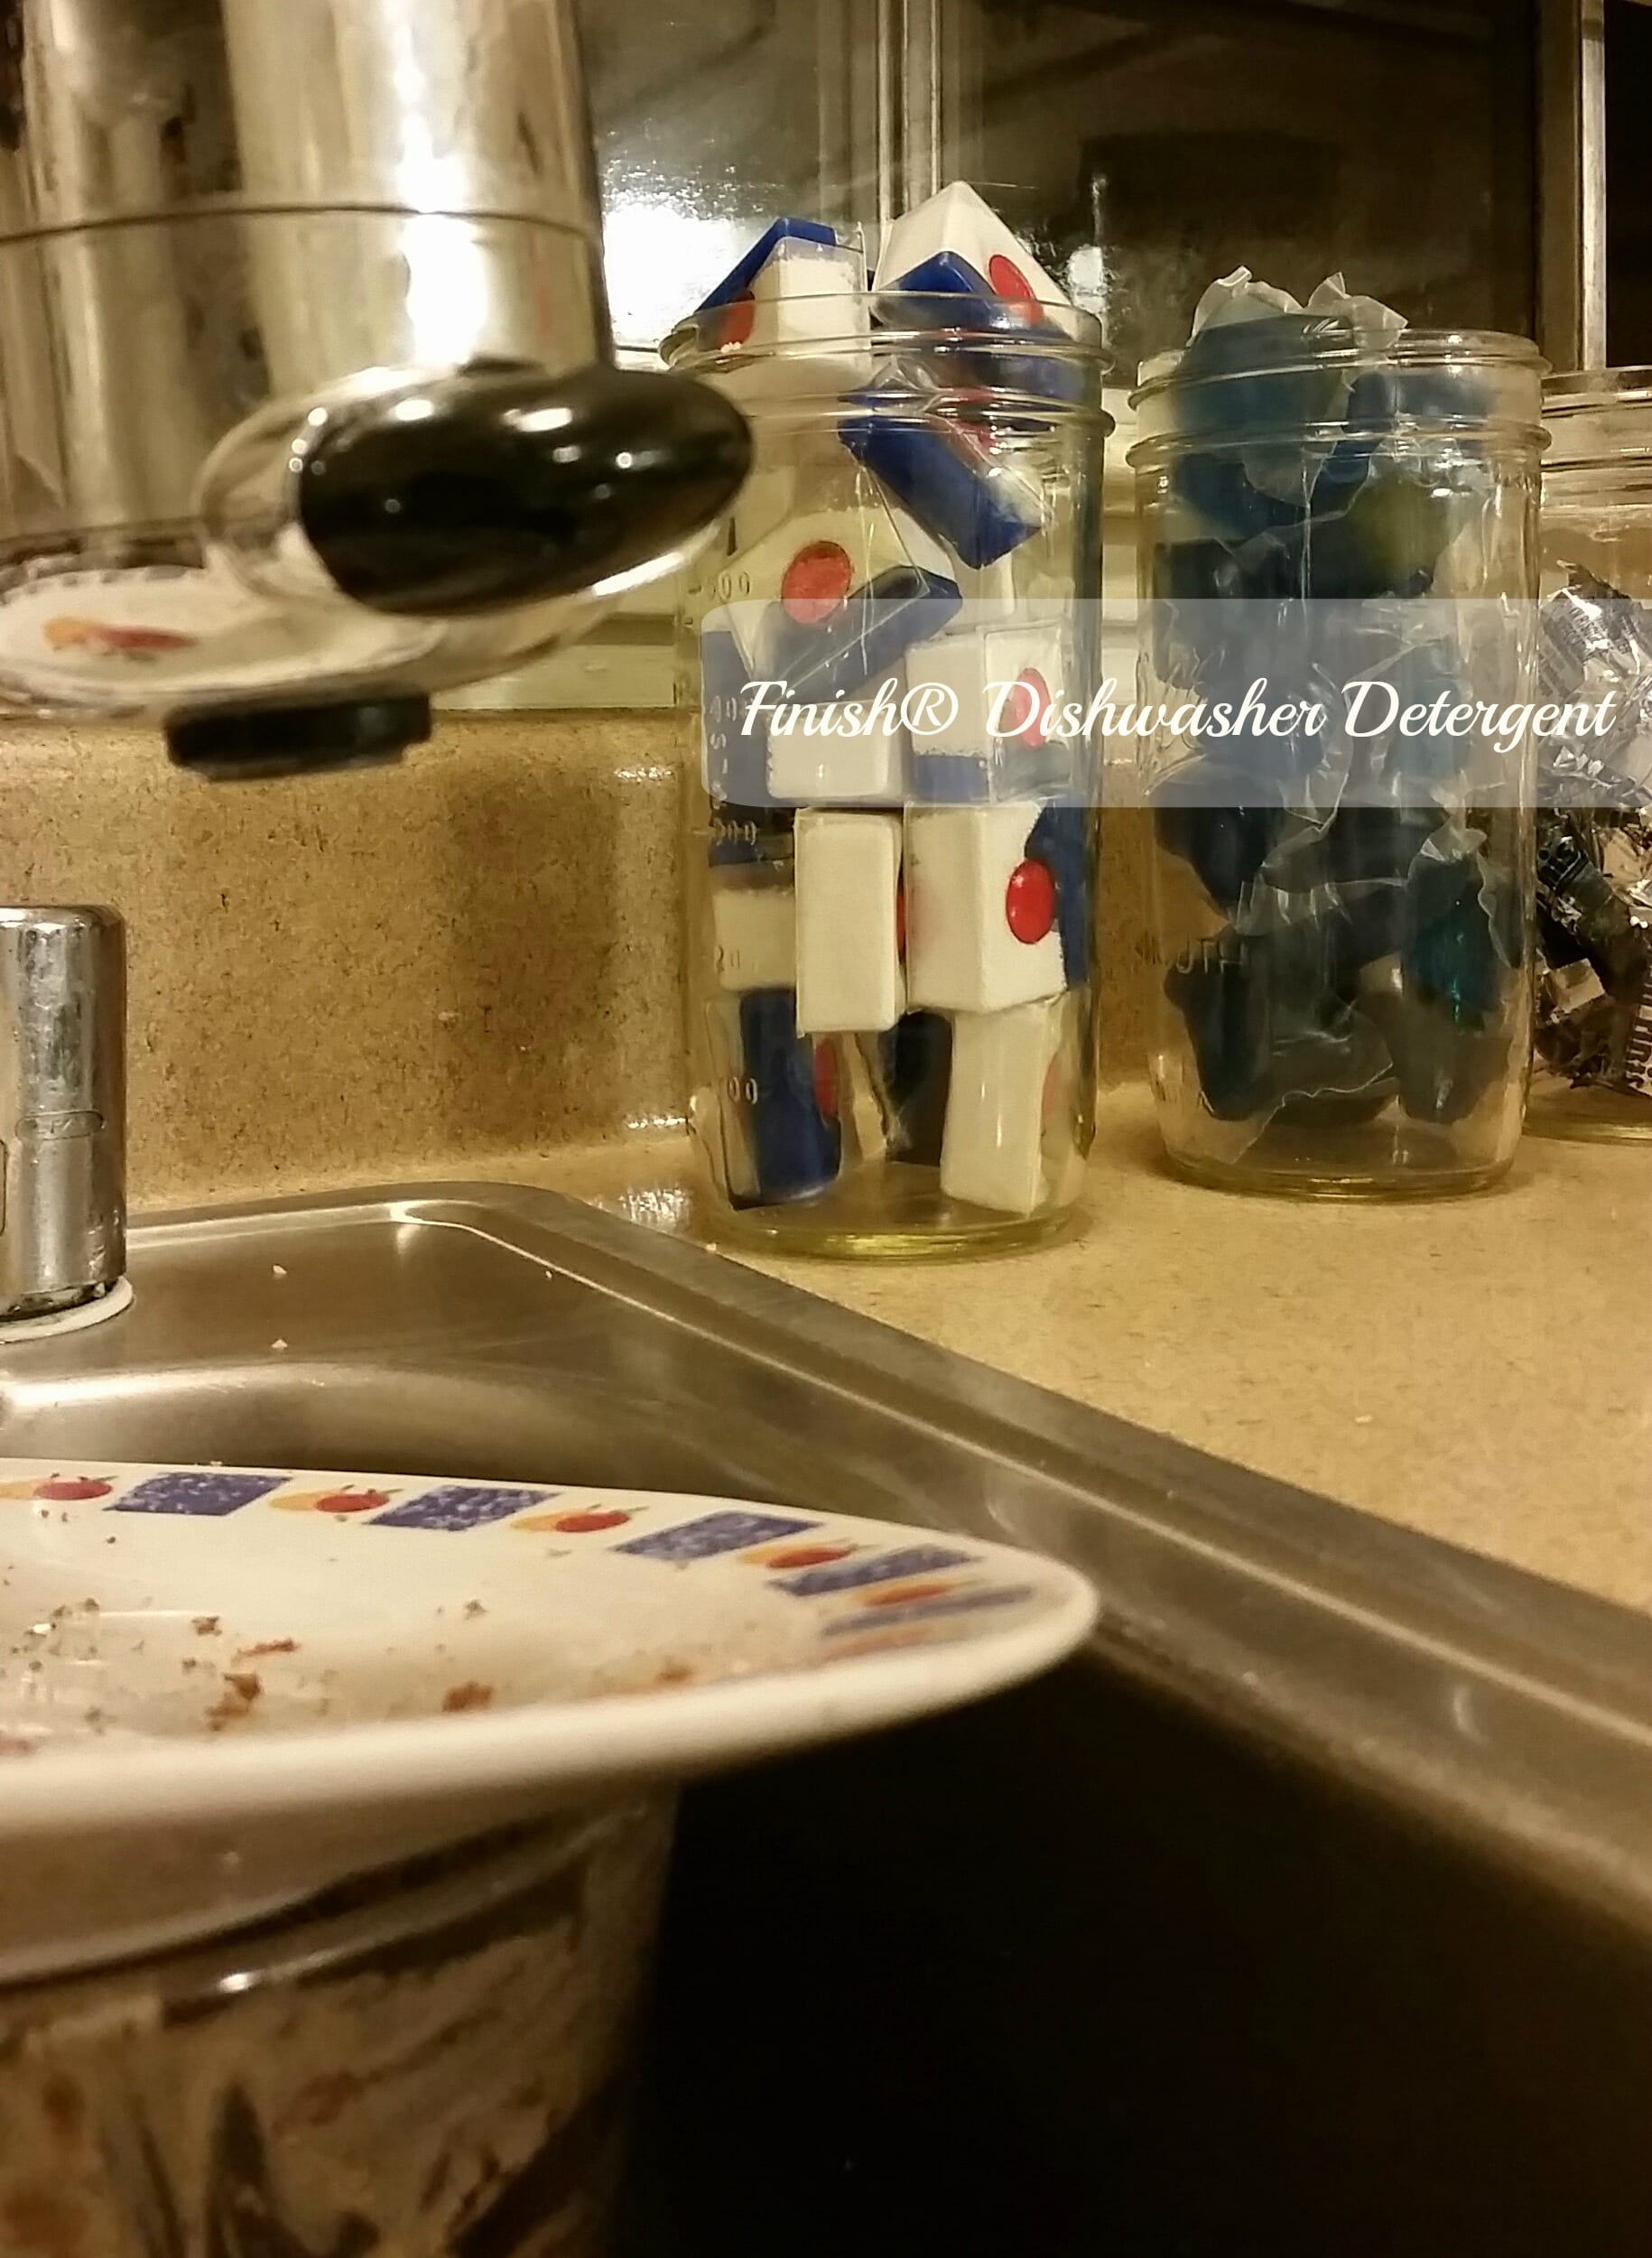 Finish quantum dishwasher tablets coupons